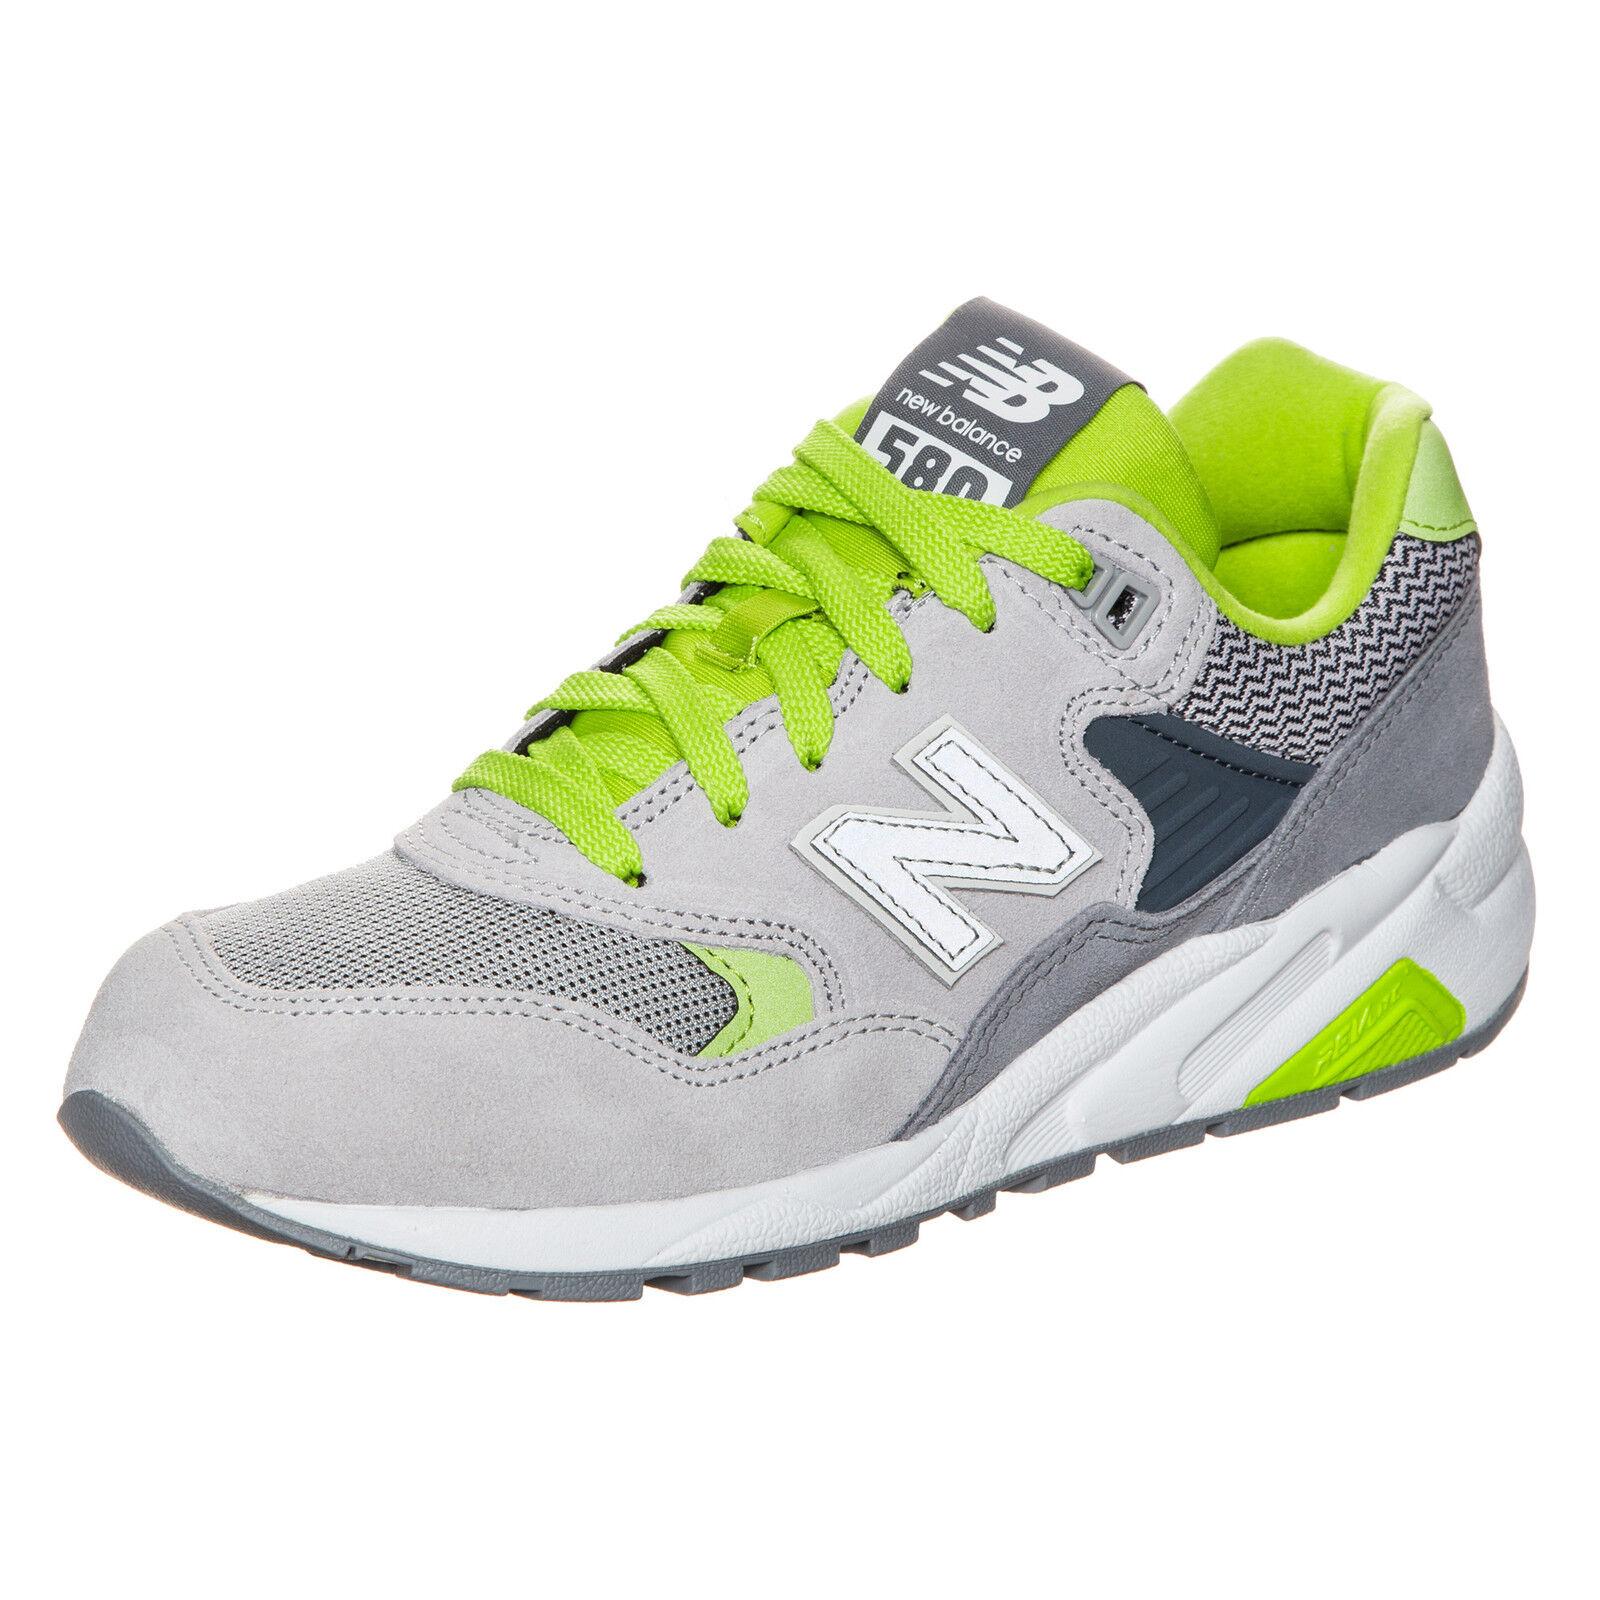 New Balance WRT580-KL-B Sneaker Damen grau / lime NEU Schuhe Turnschuhe